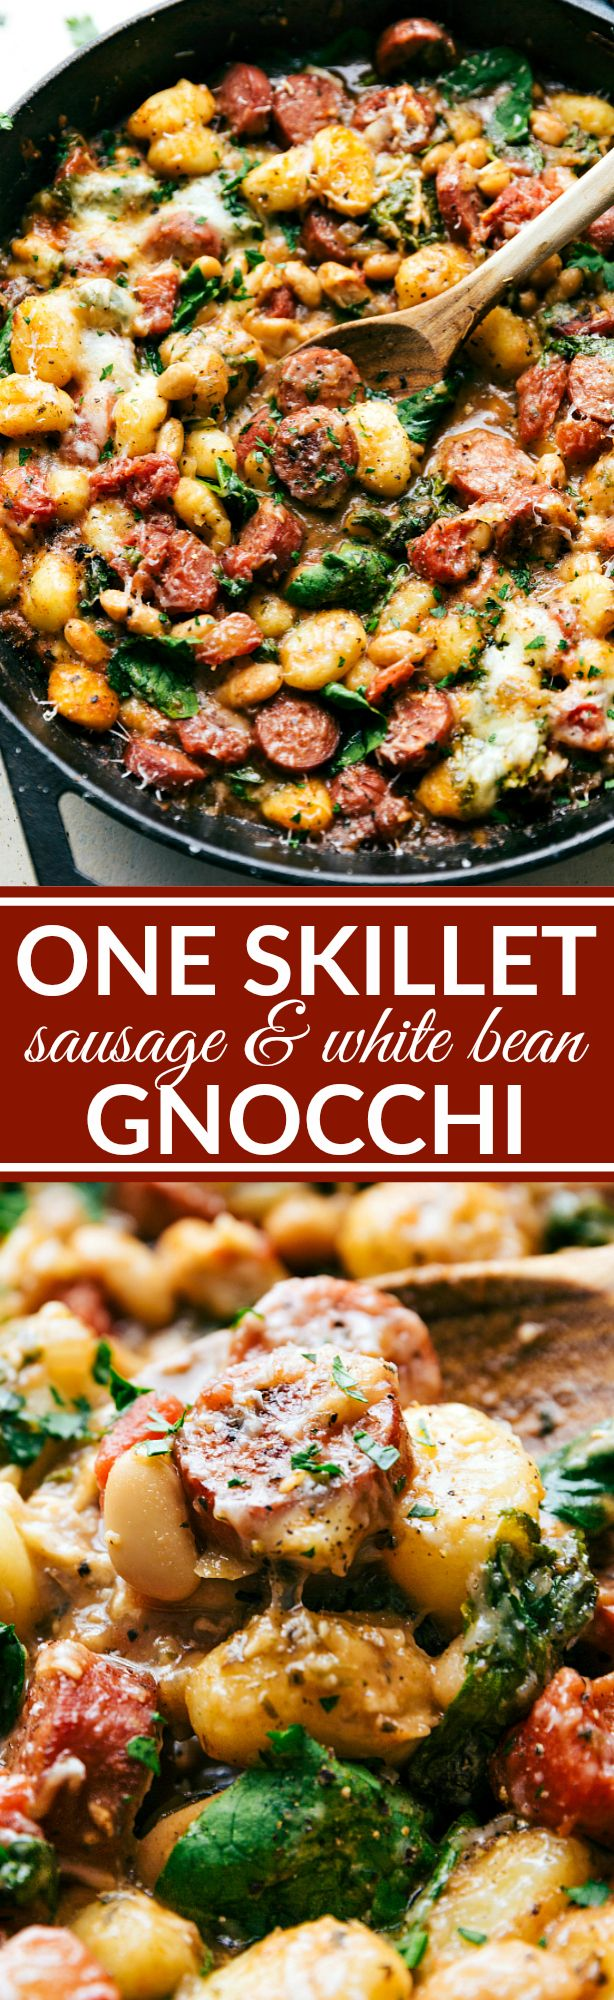 One Skillet Sausage